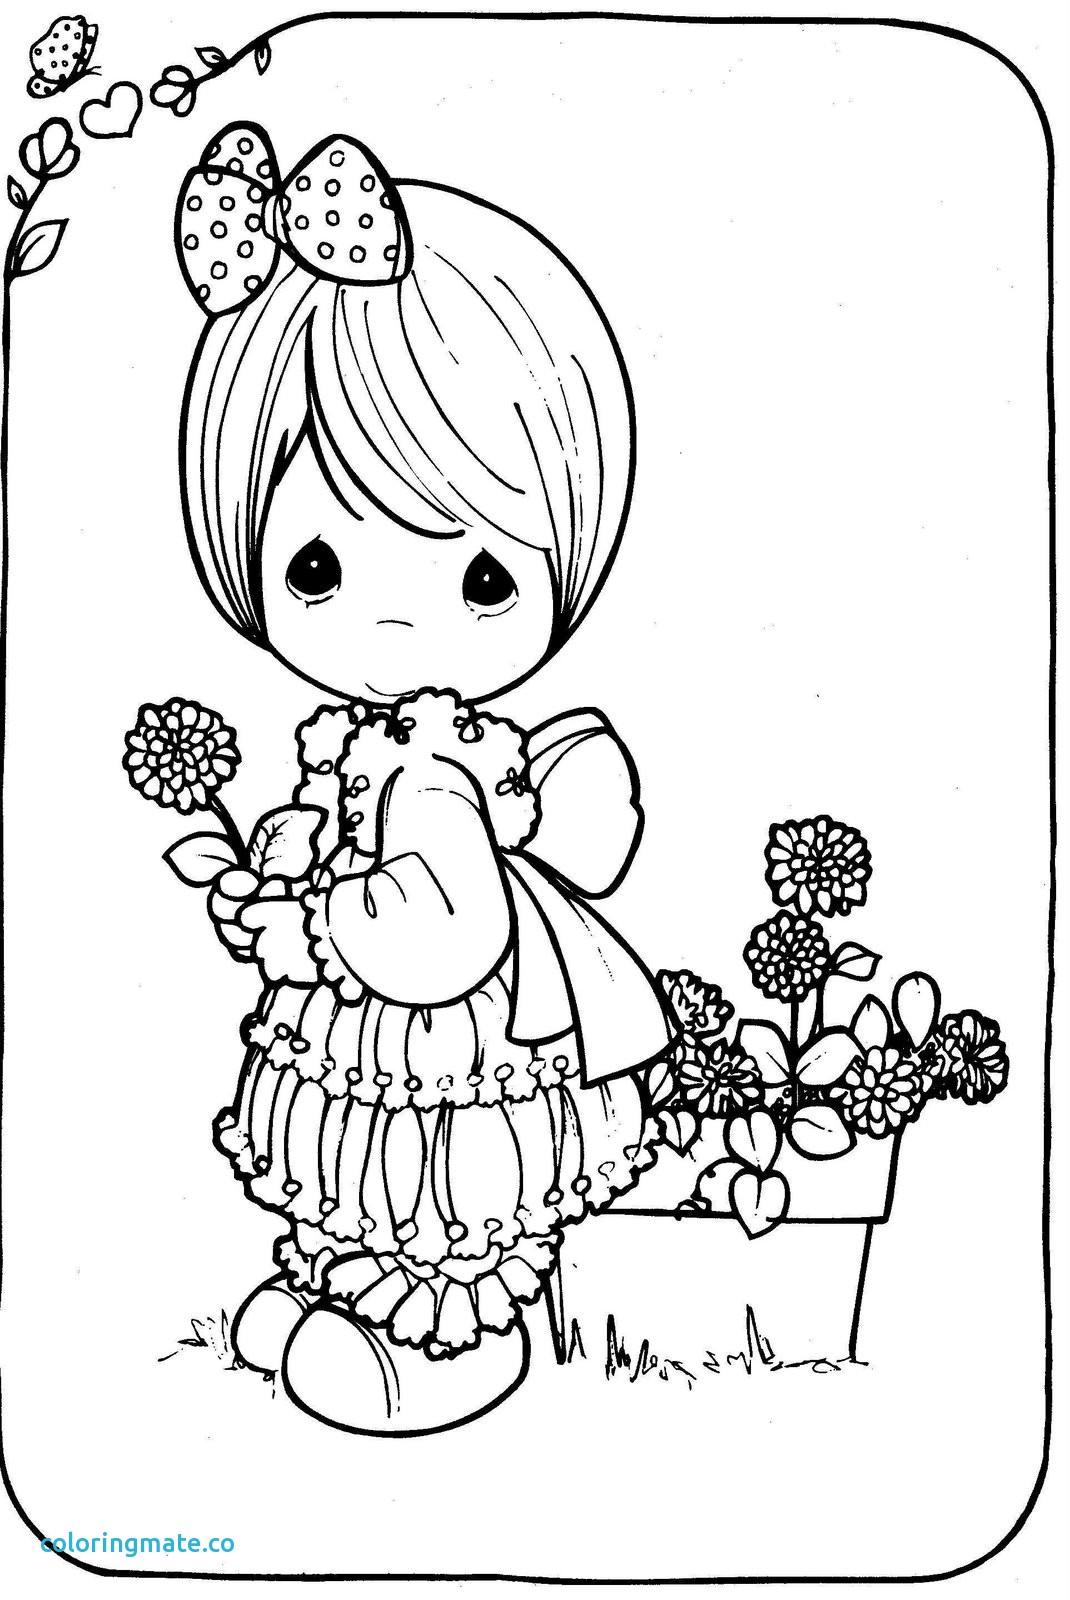 1070x1600 Precious Moments Coloring Pages Elegant Drawing Girl Precious